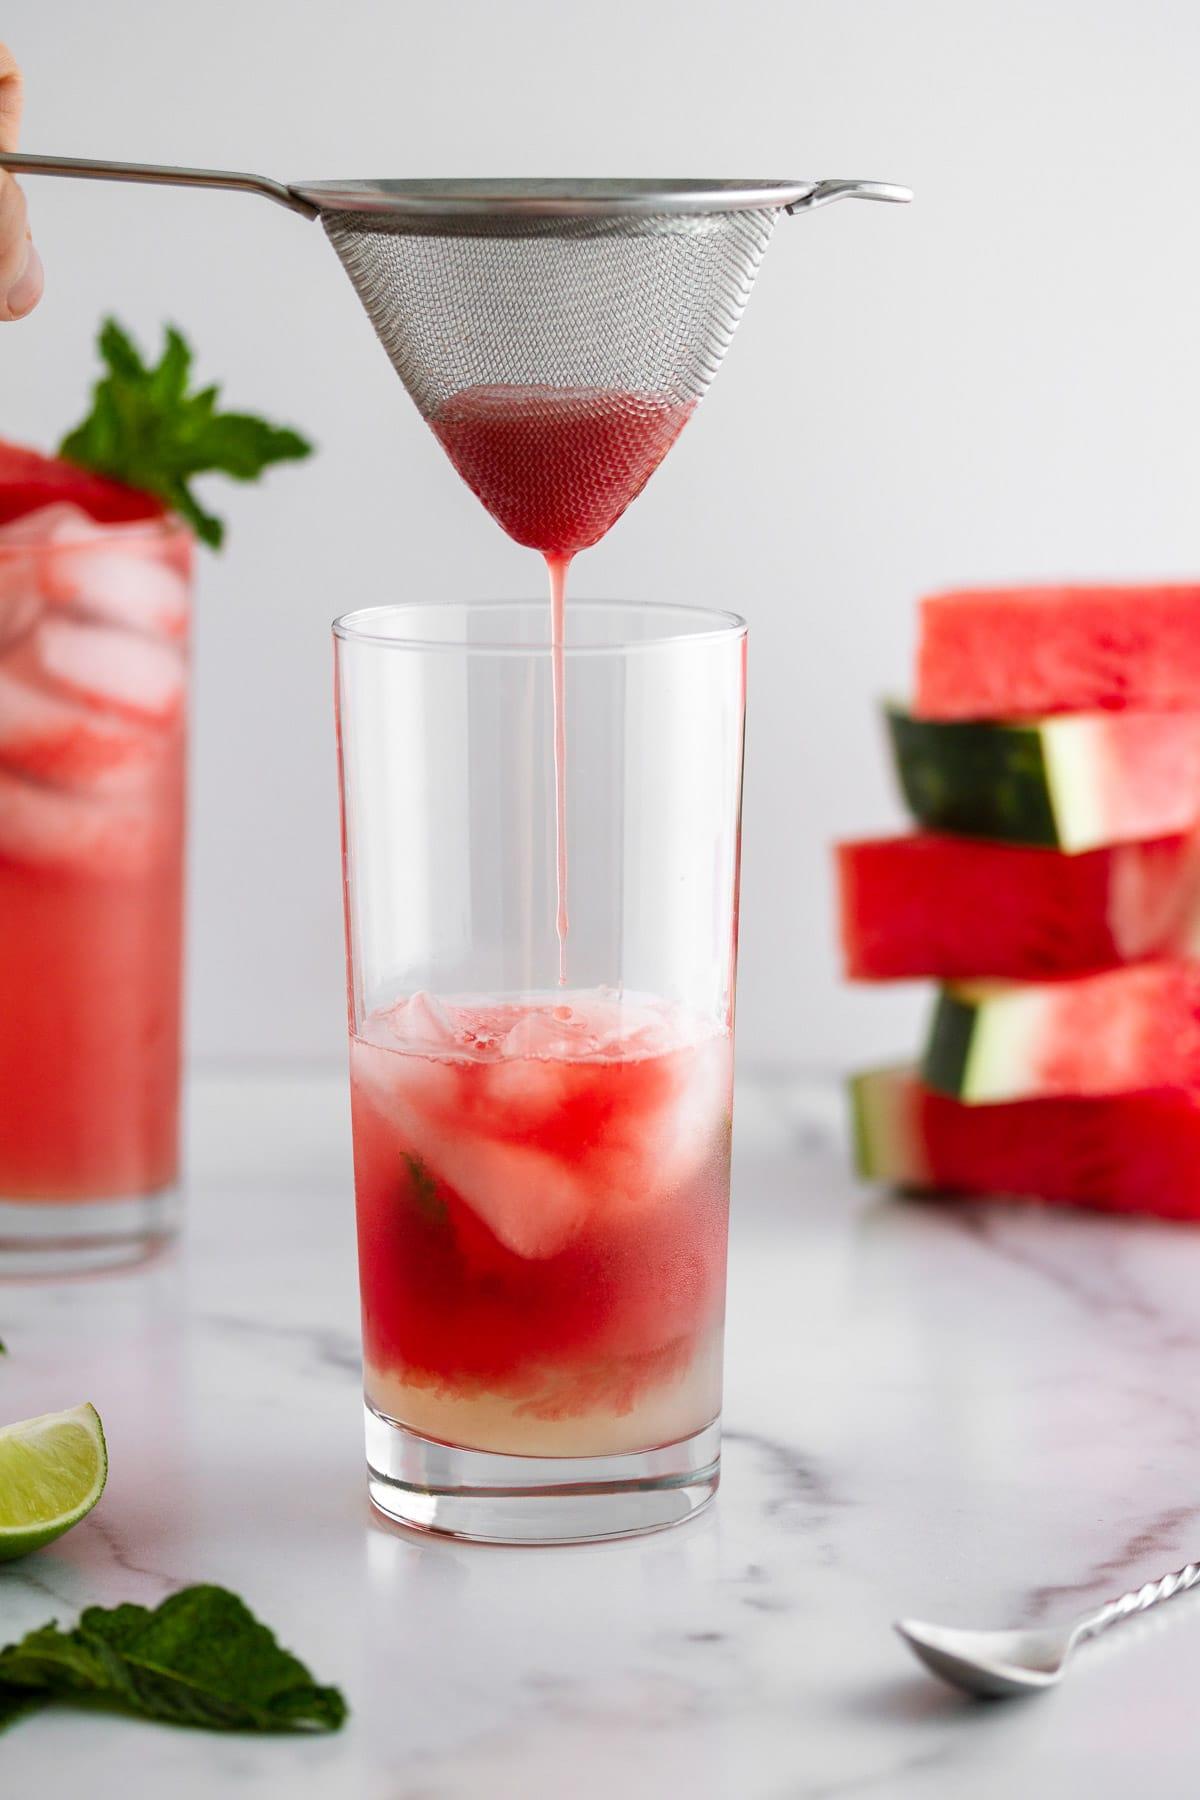 straining watermelon juice into a glass